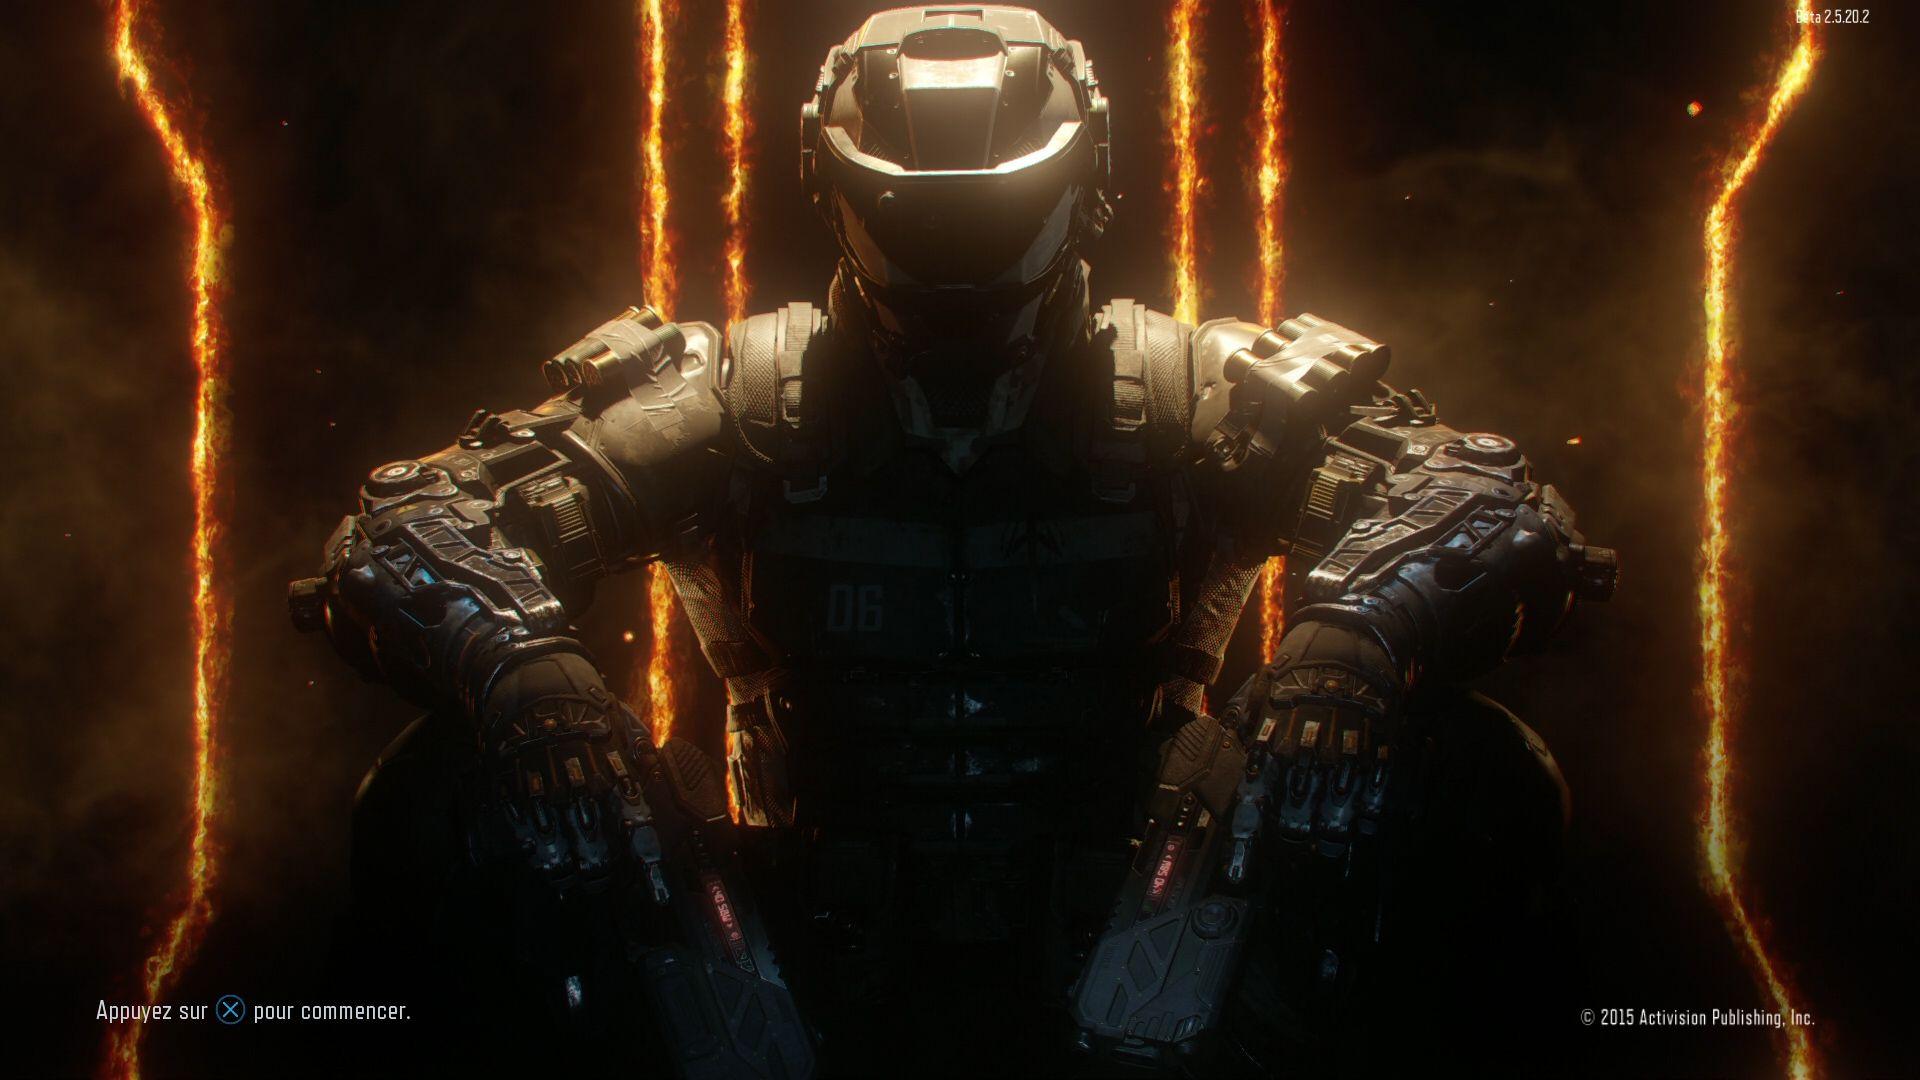 Preview du multijoueur de Call of Duty : Black Ops III | Takuminosekai.com